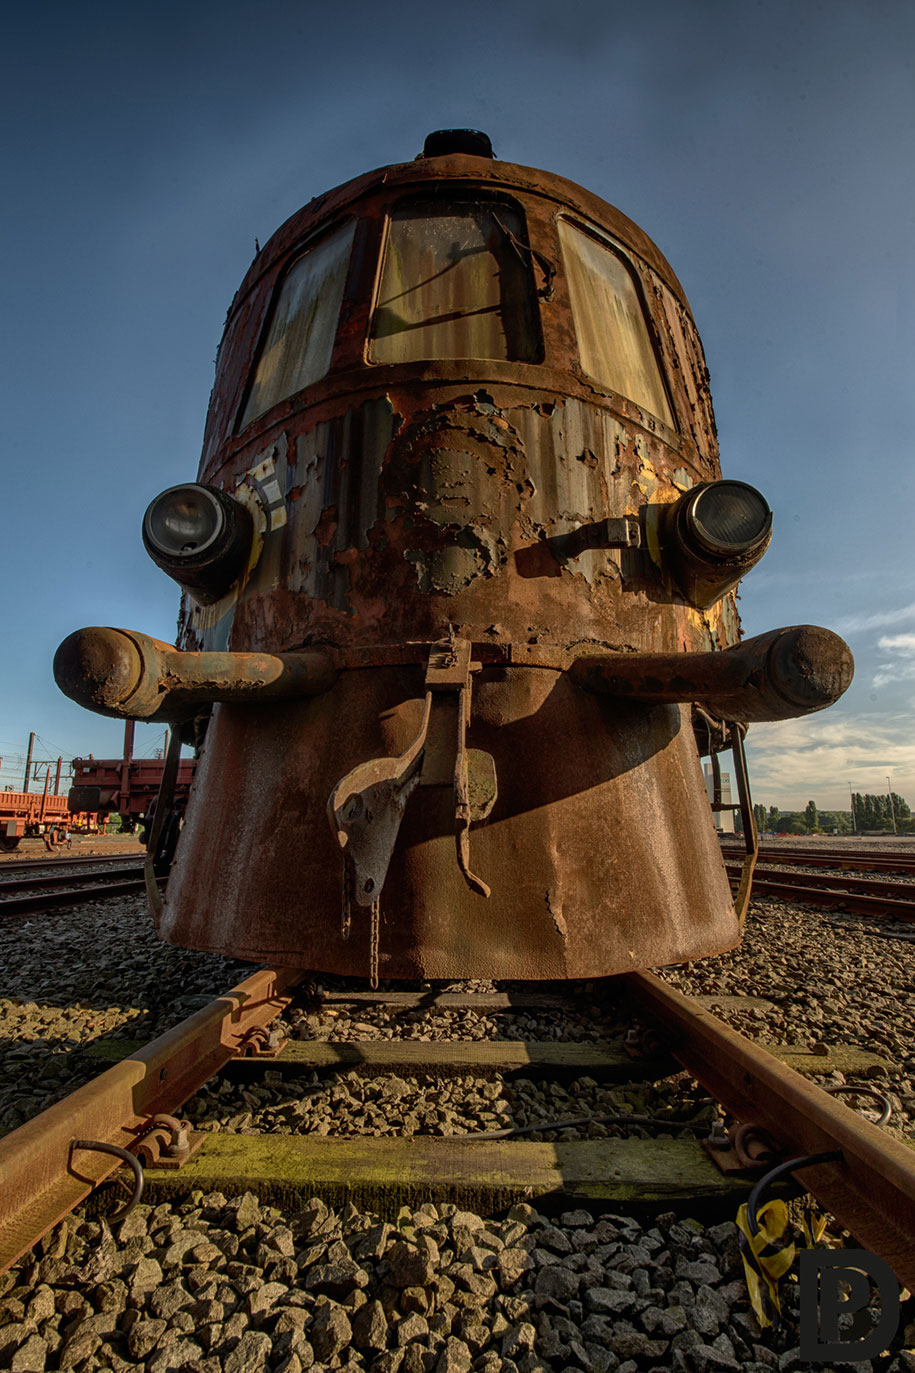 abandoned-train-orient-express-urban-exploration-brian-belgium-5